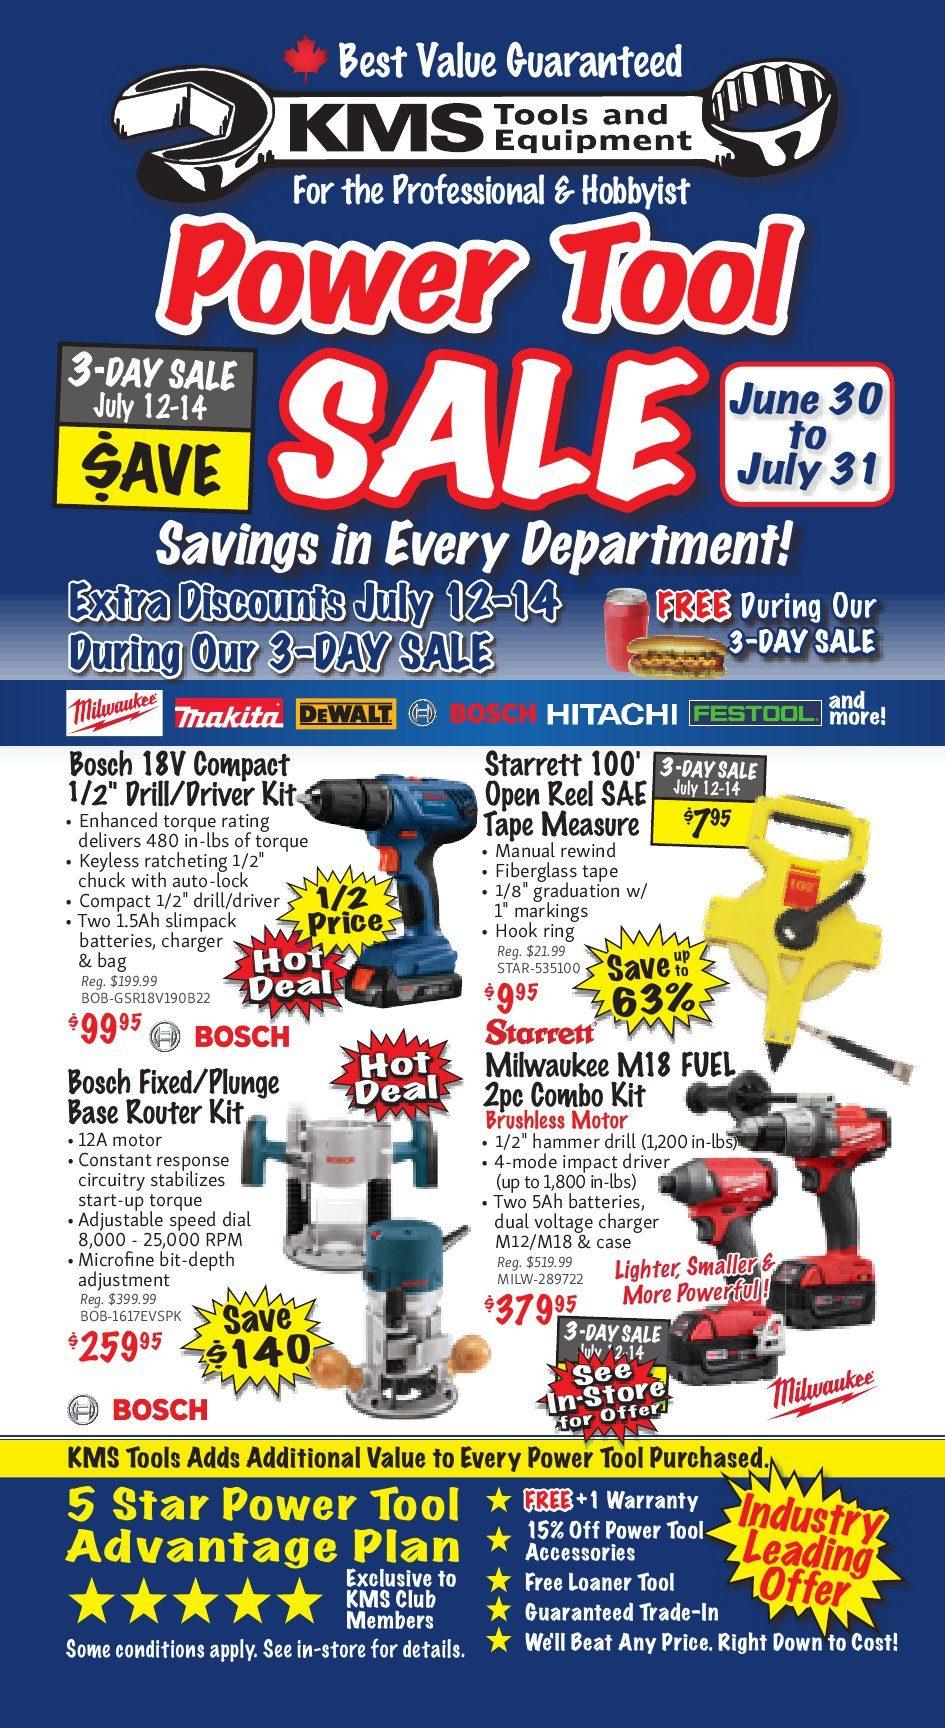 Power Tool Sale - KMS Tools June 30 2018 | YP Shopwise